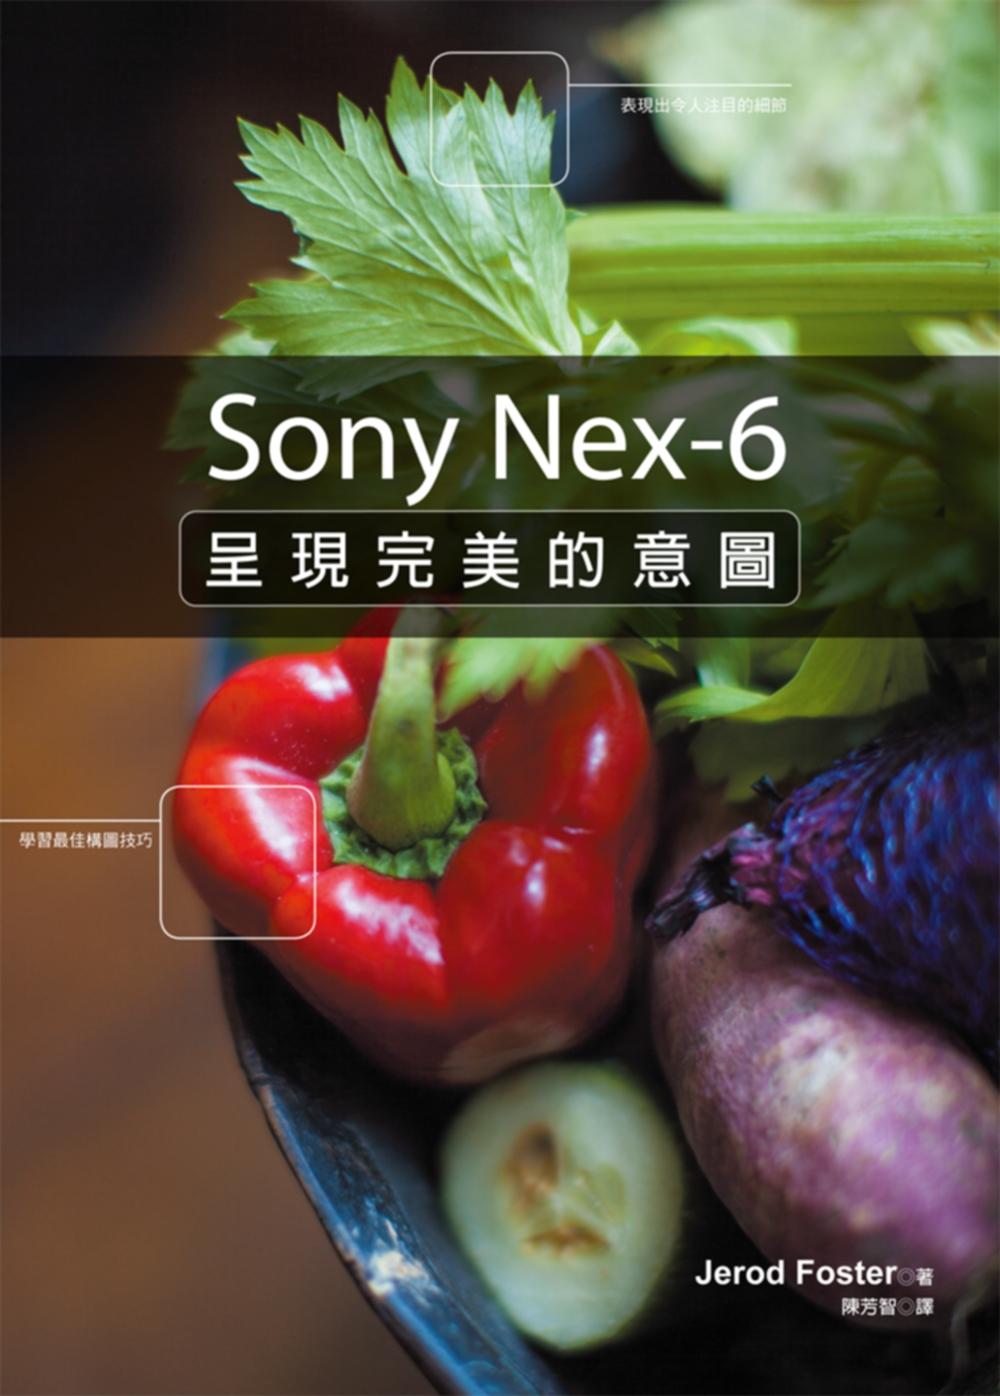 Sony Nex-6 呈現完美的意圖